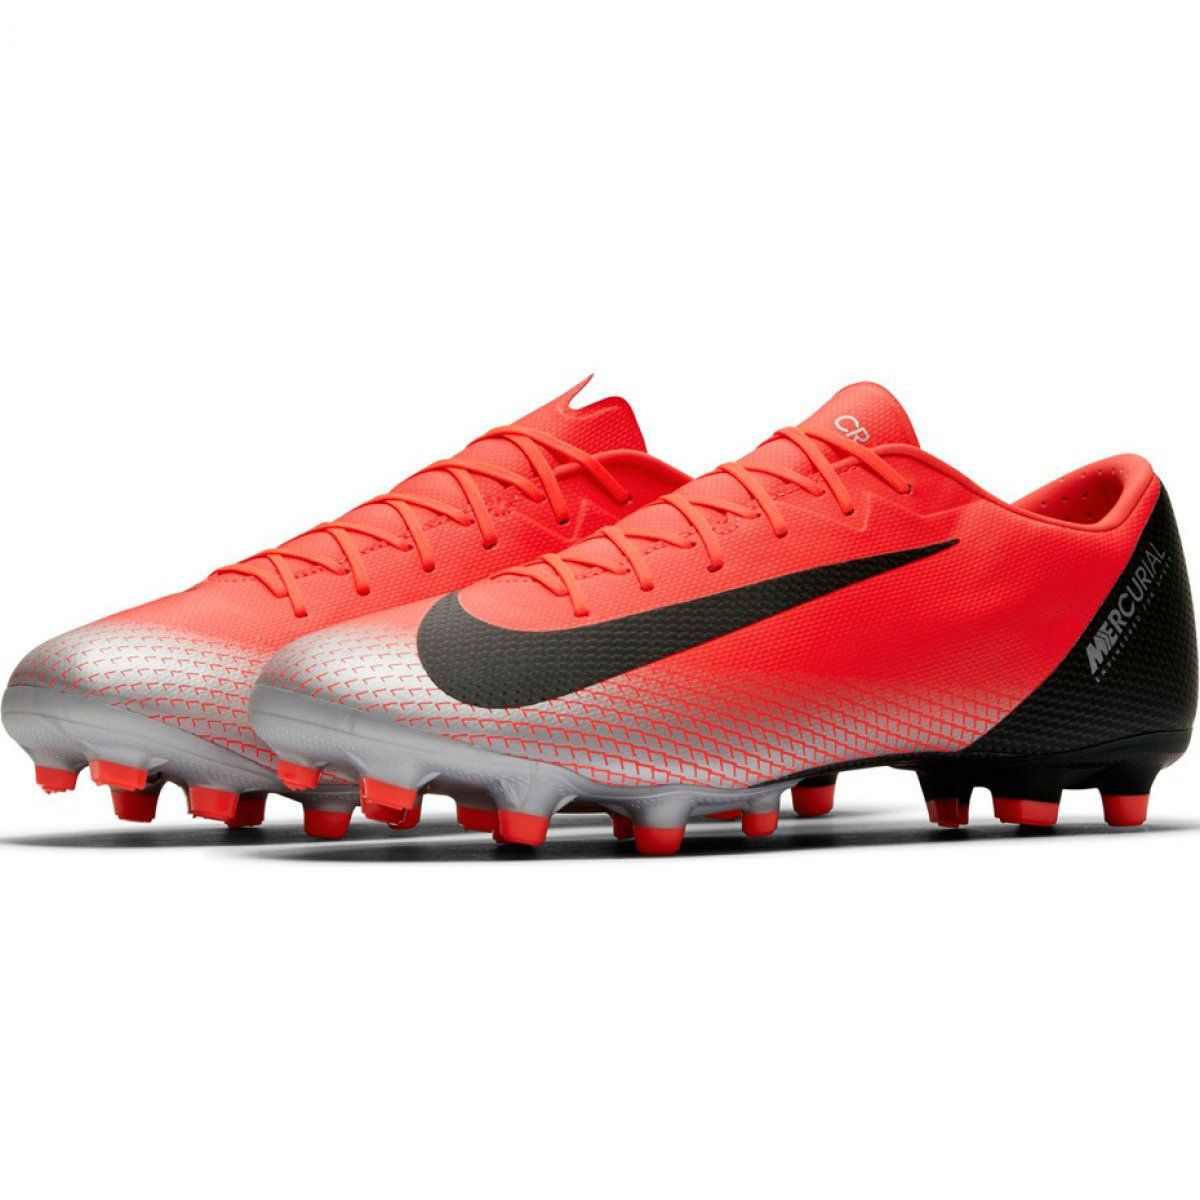 Buty Pilkarskie Nike Mercurial Vapor 12 Academy Cr7 Mg M Aj3721 600 Wielokolorowe Czerwone Football Shoes Mens Football Boots Shoes